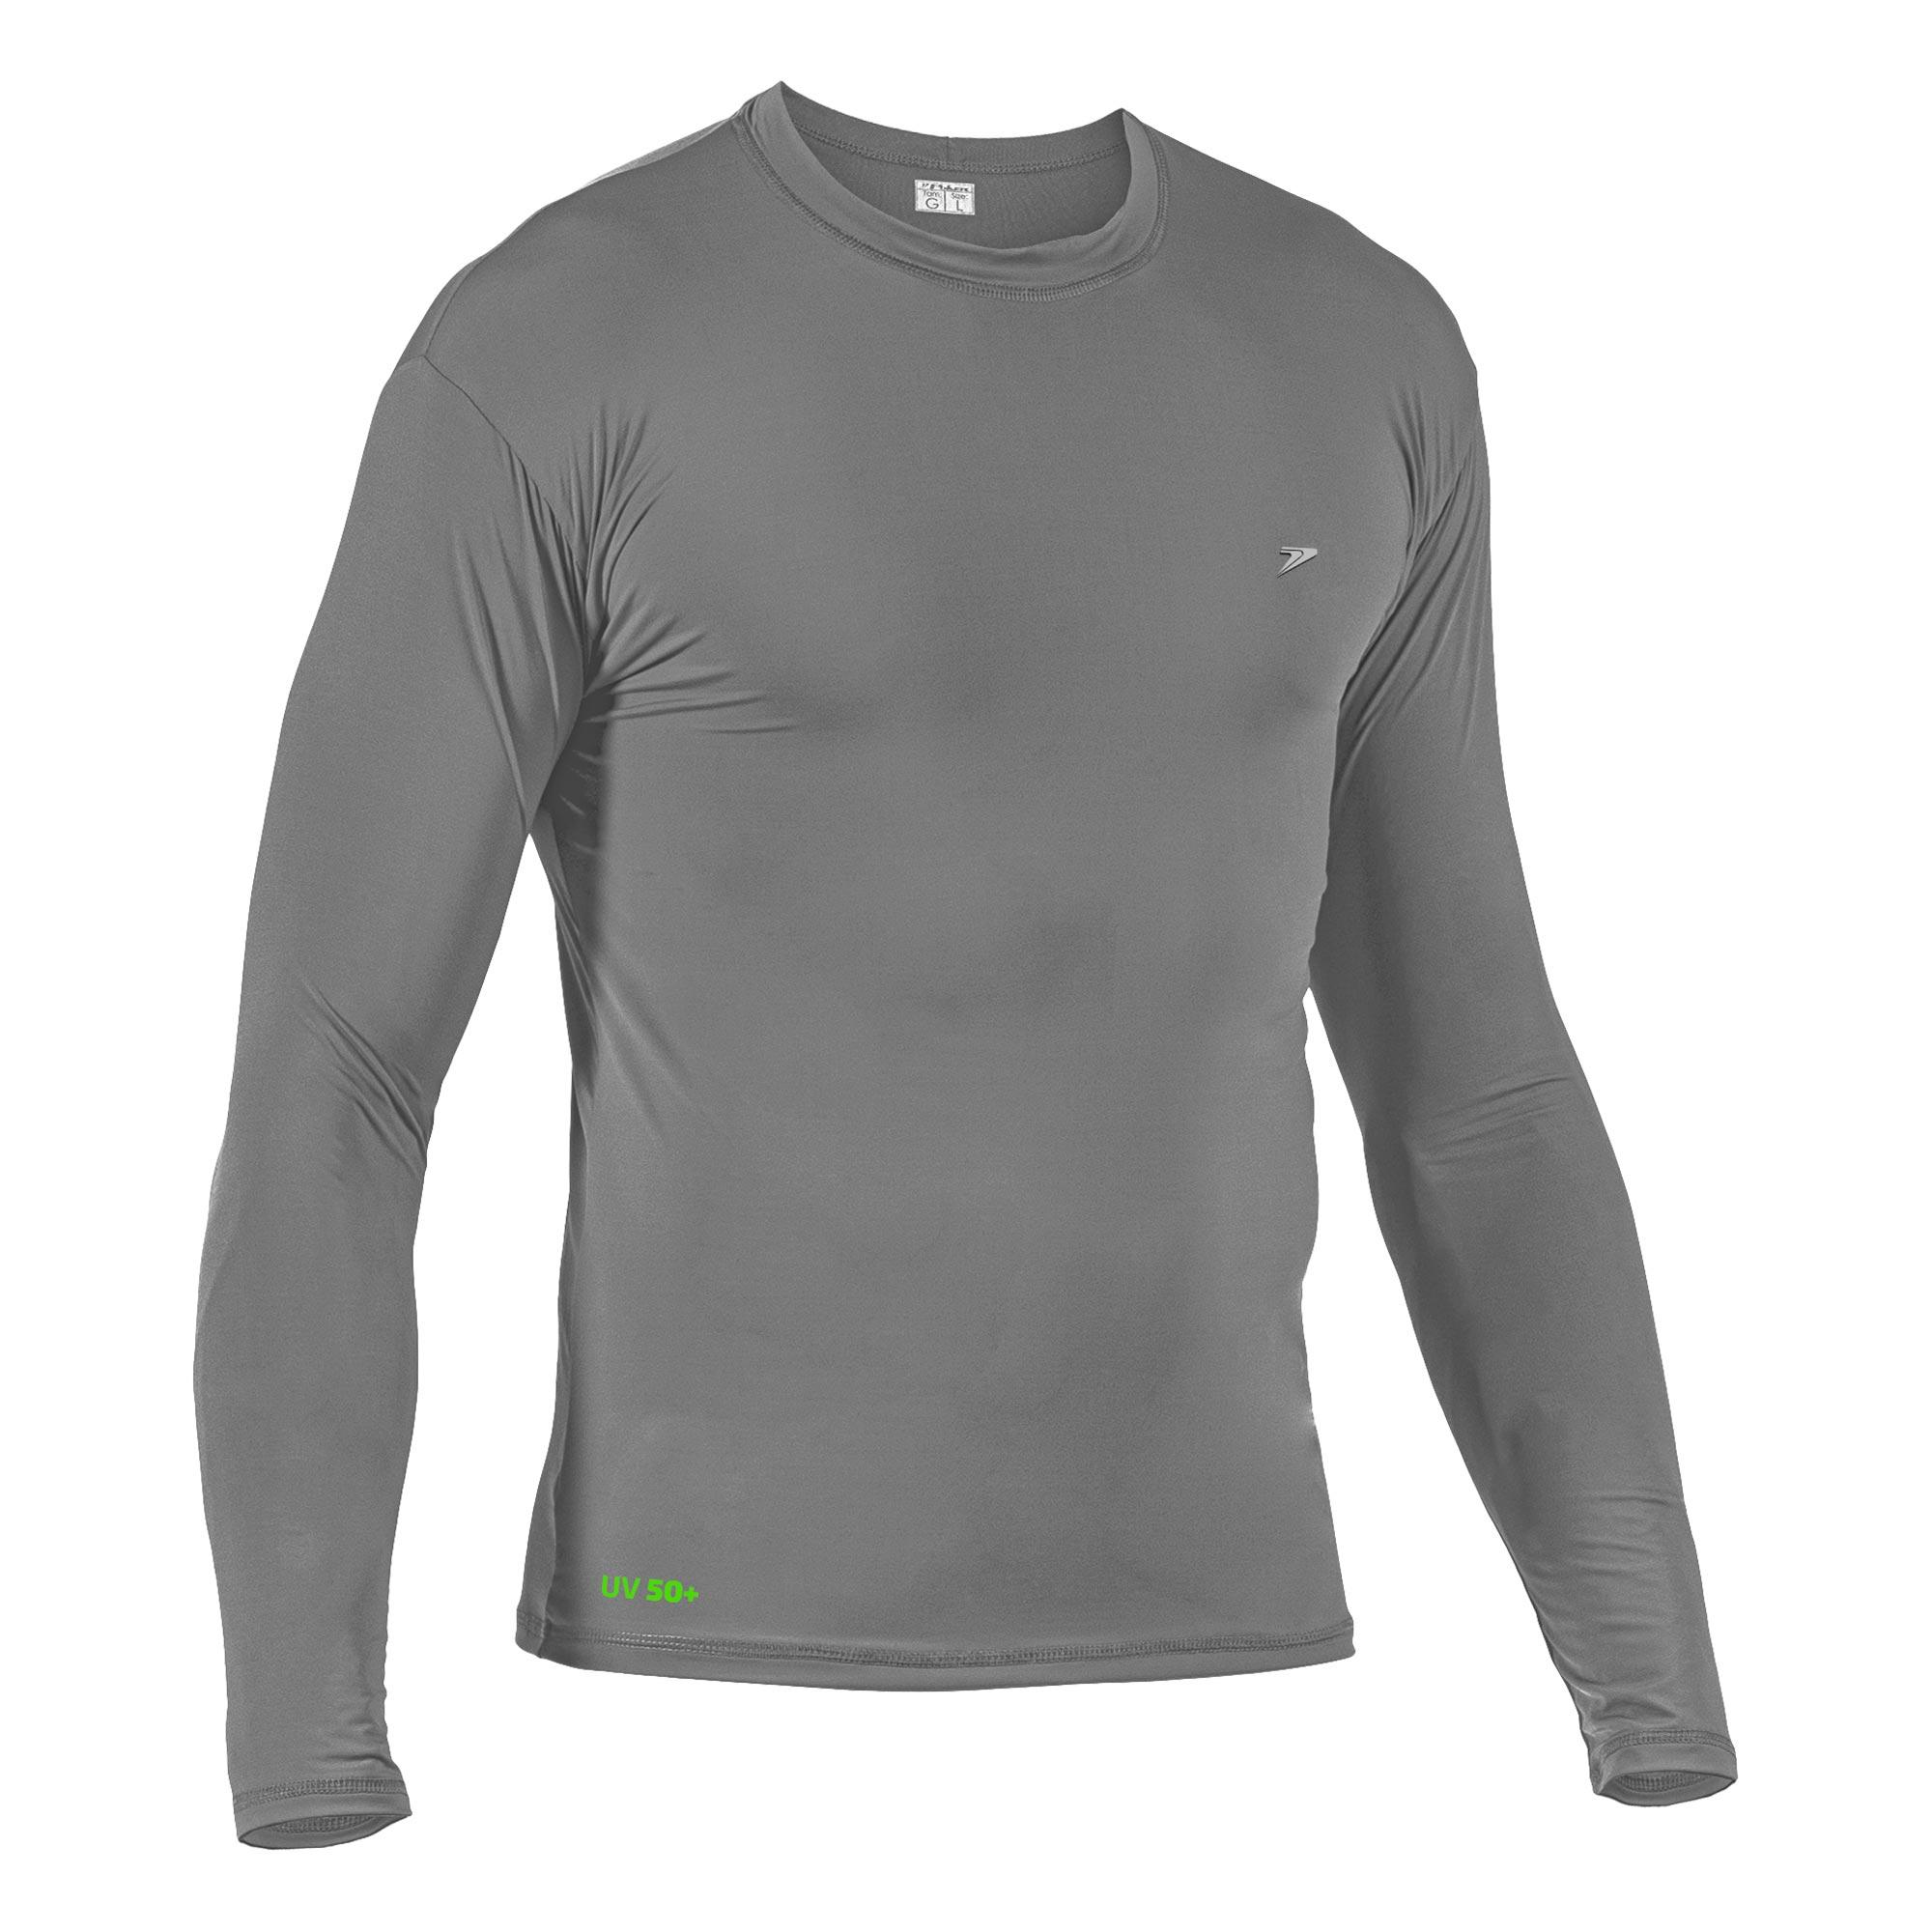 Kit Camisa proteção UV + Bermuda + Máscara Antiviral